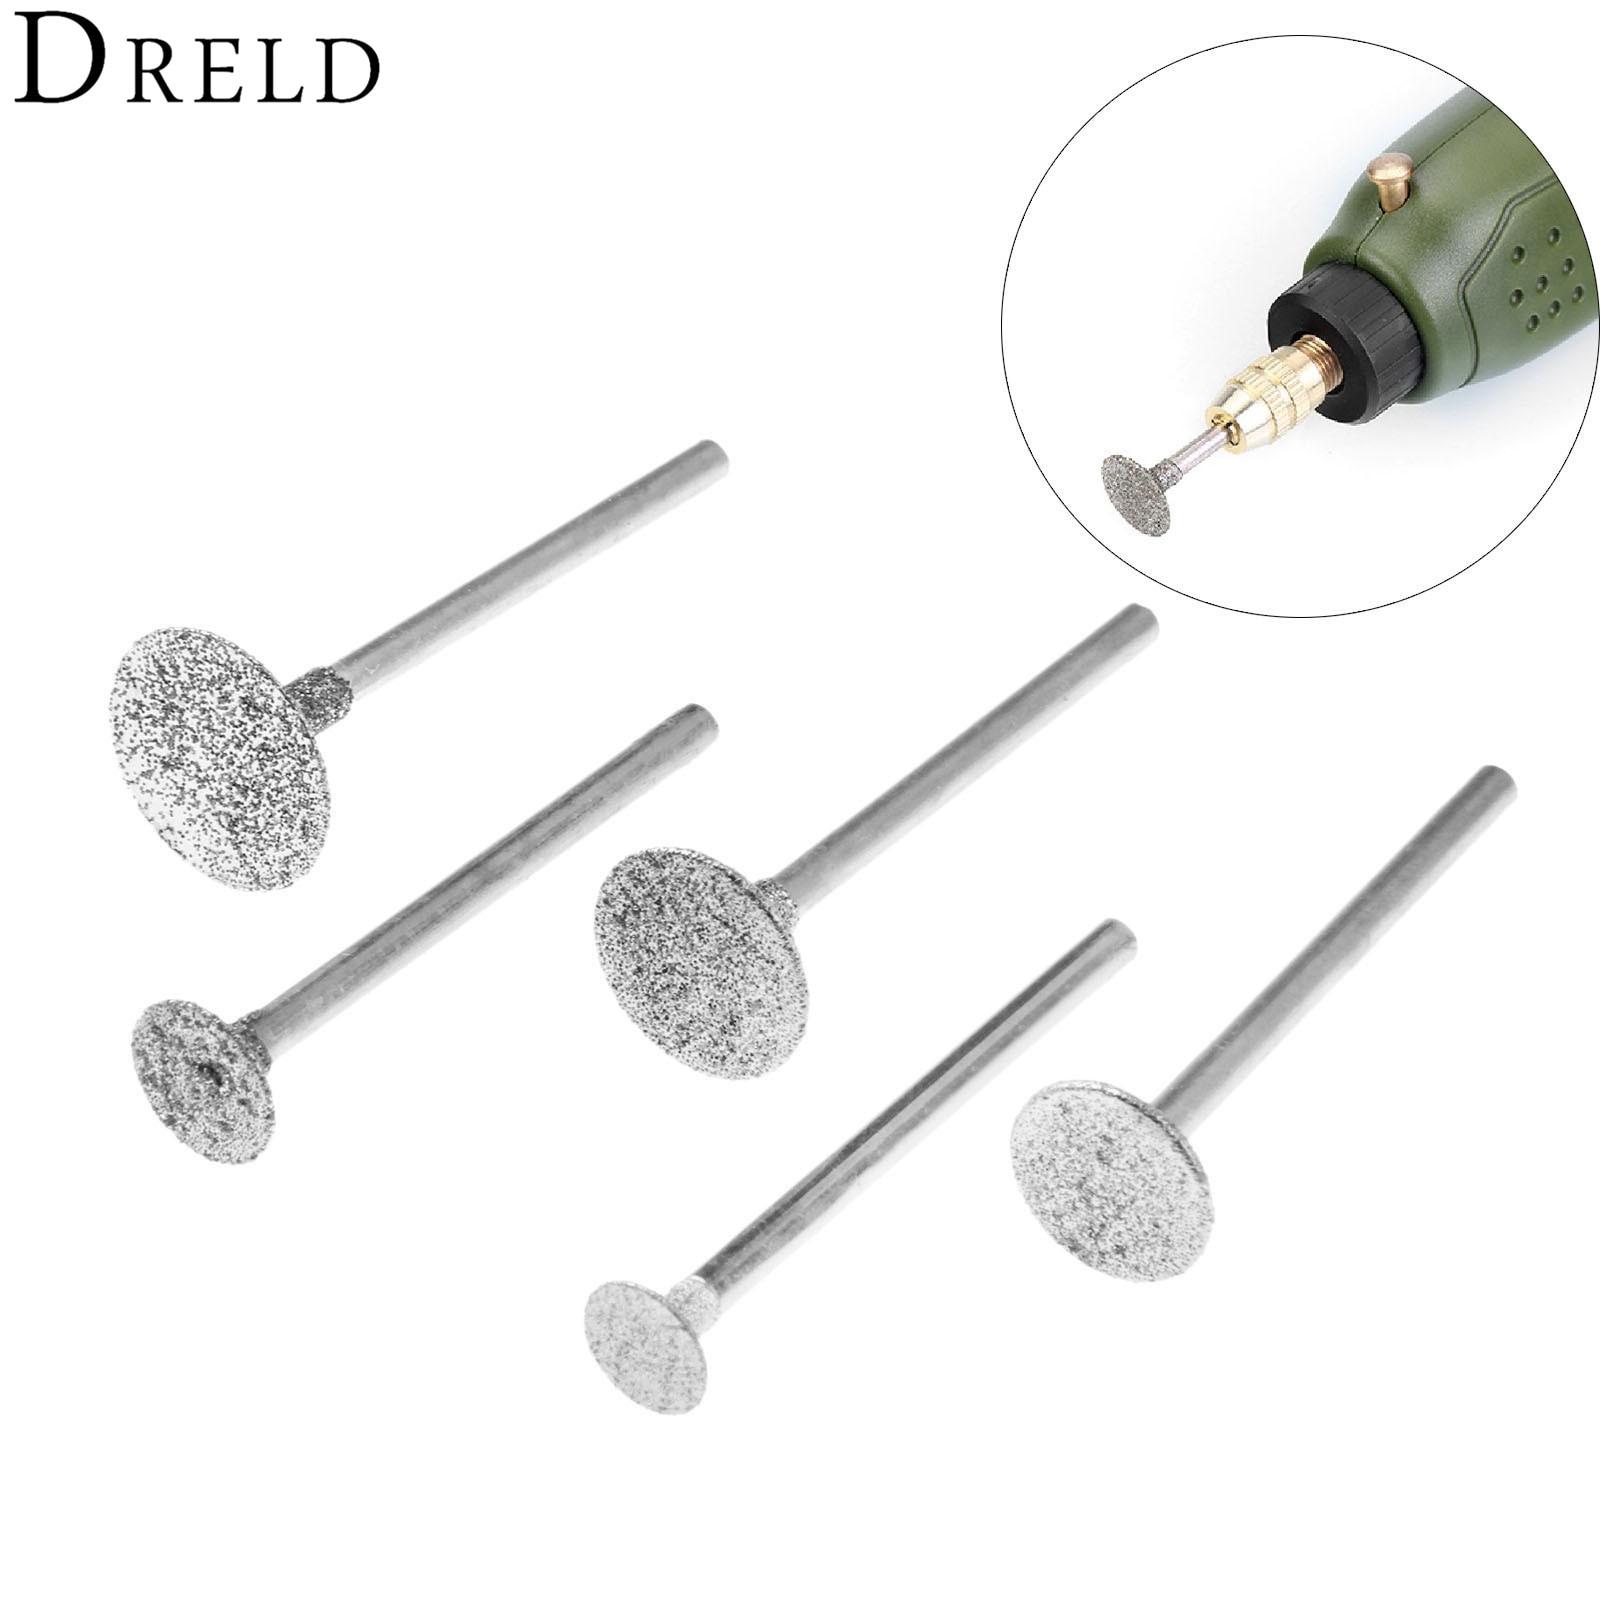 DRELD 5Pcs 3mm Shank Carborundum Electric Polishing Grinding Head Buffing Polishing Wheel For Dremel Rotary Tools